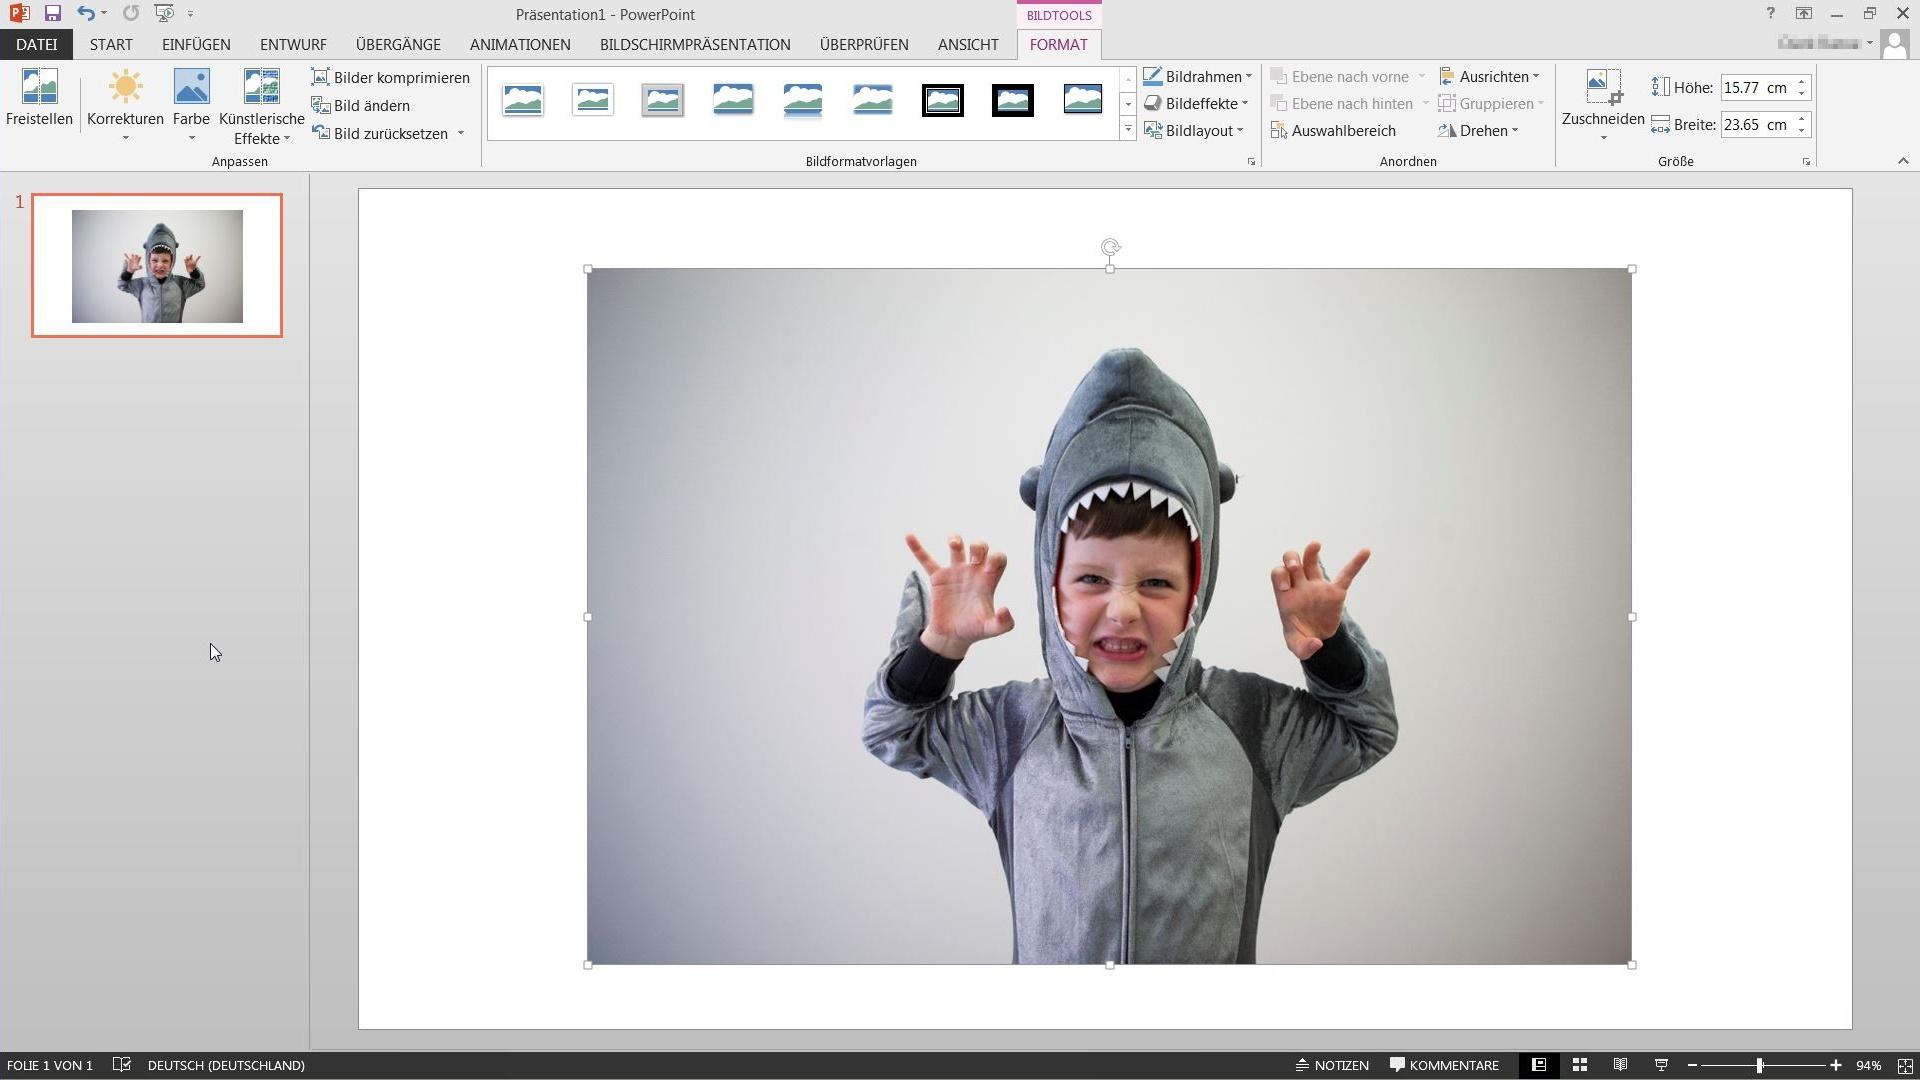 HubSpot-01-Bild-in-PowerPoint-einfuegen